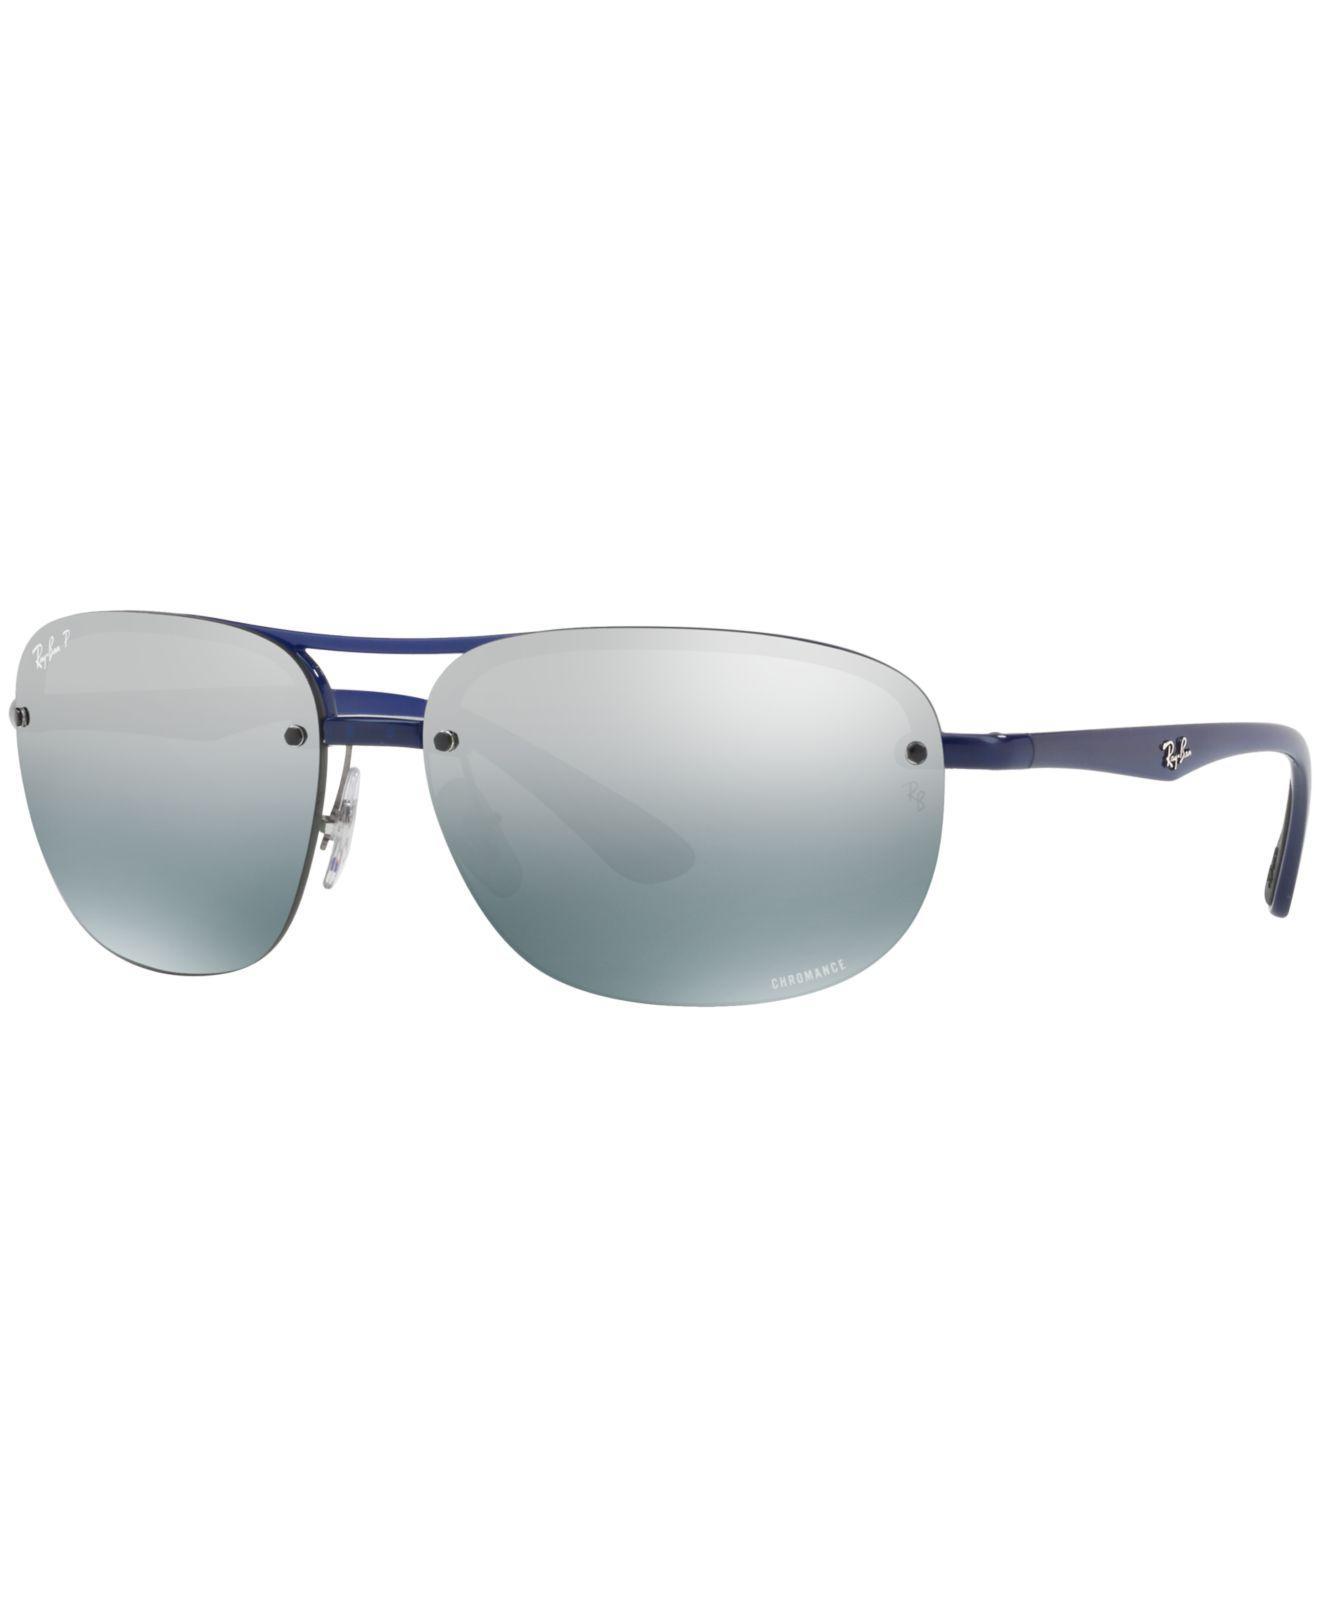 549f097c9e Ray-Ban. Men s Blue Polarized Chromance Collection Sunglasses ...